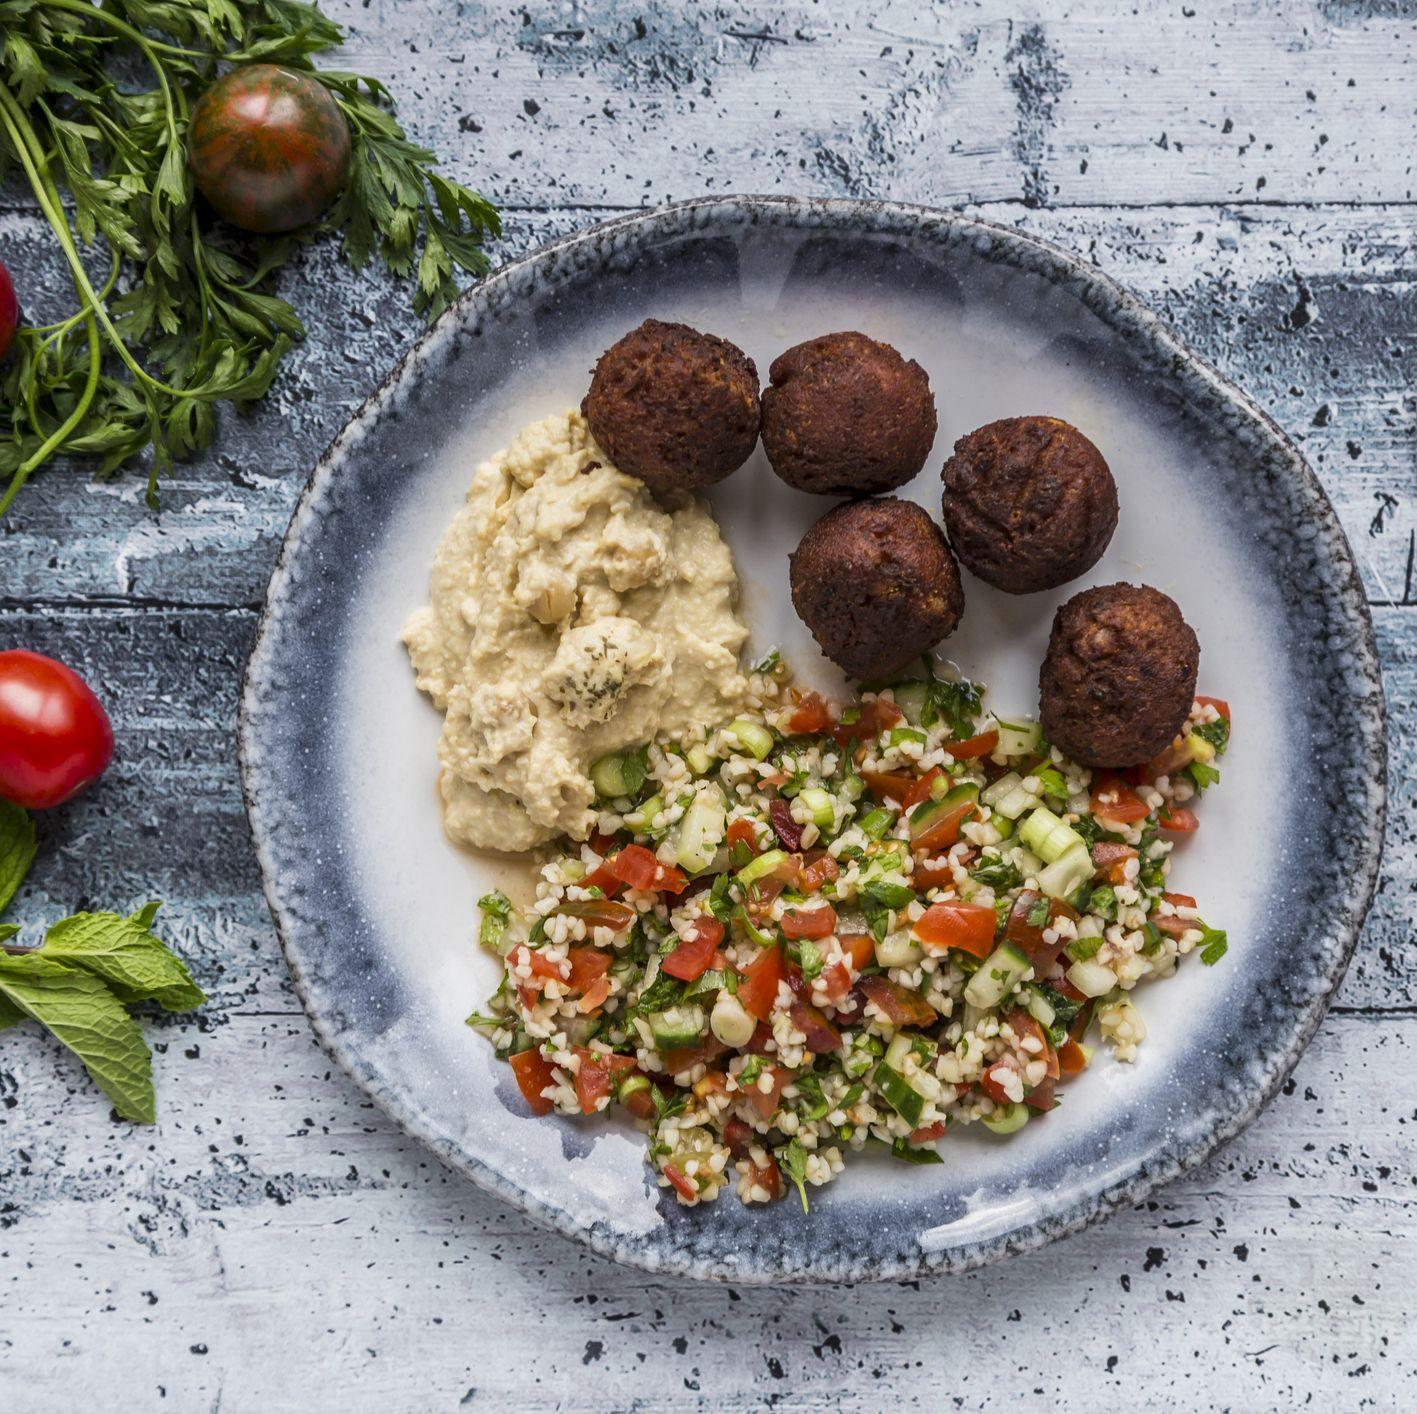 Is Falafel Healthy Or Am I Kidding Myself?